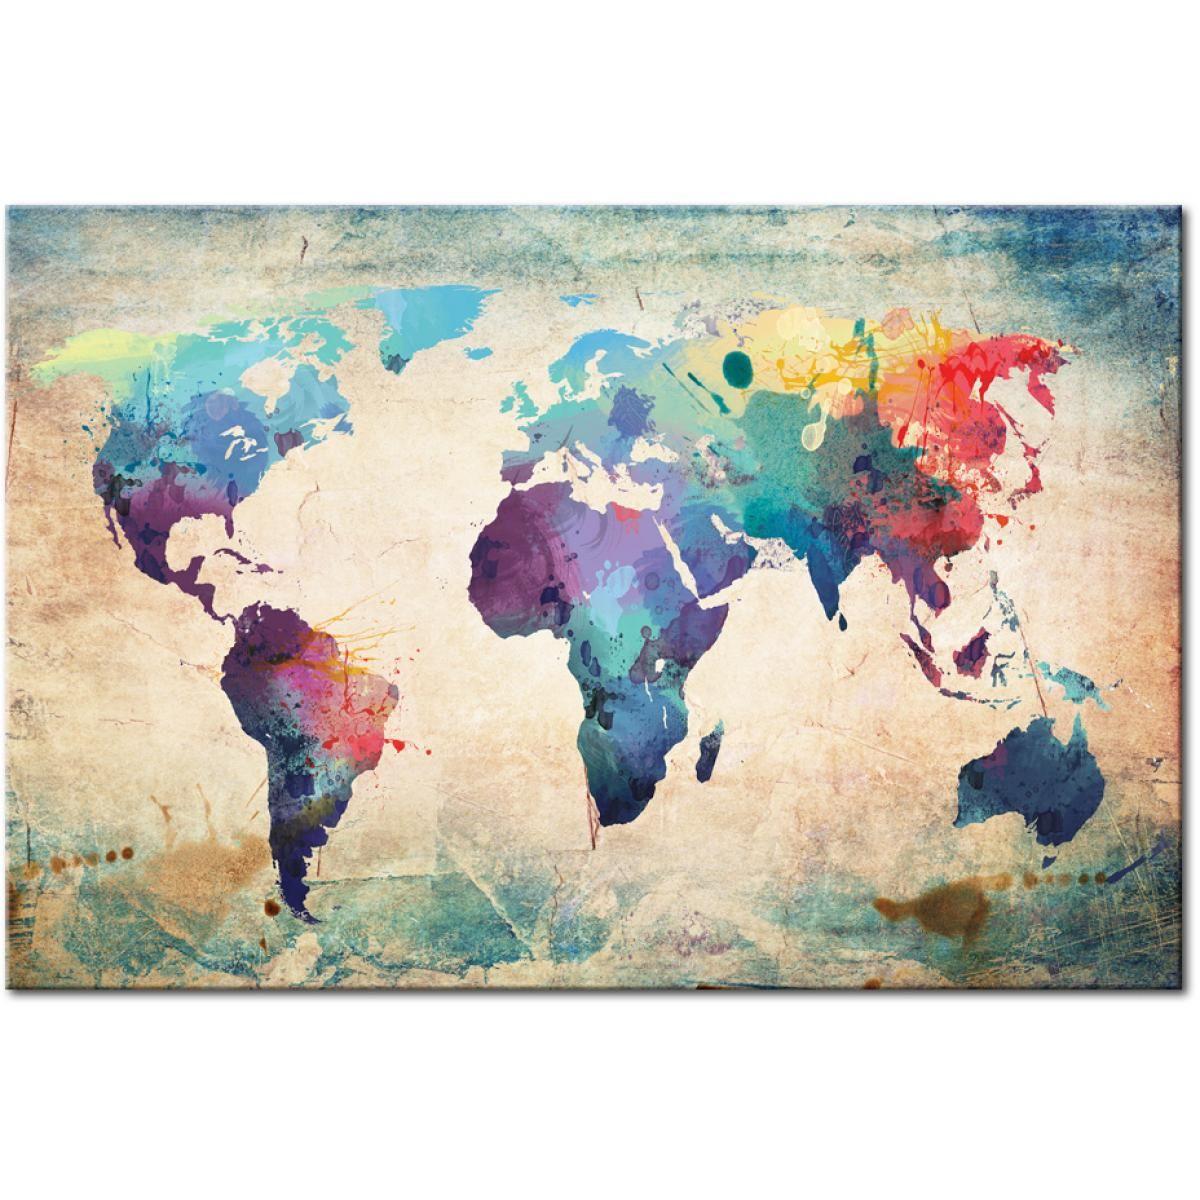 Cuadros mapamundi mapas decorativos sobre lienzo mapas for Todo decoracion